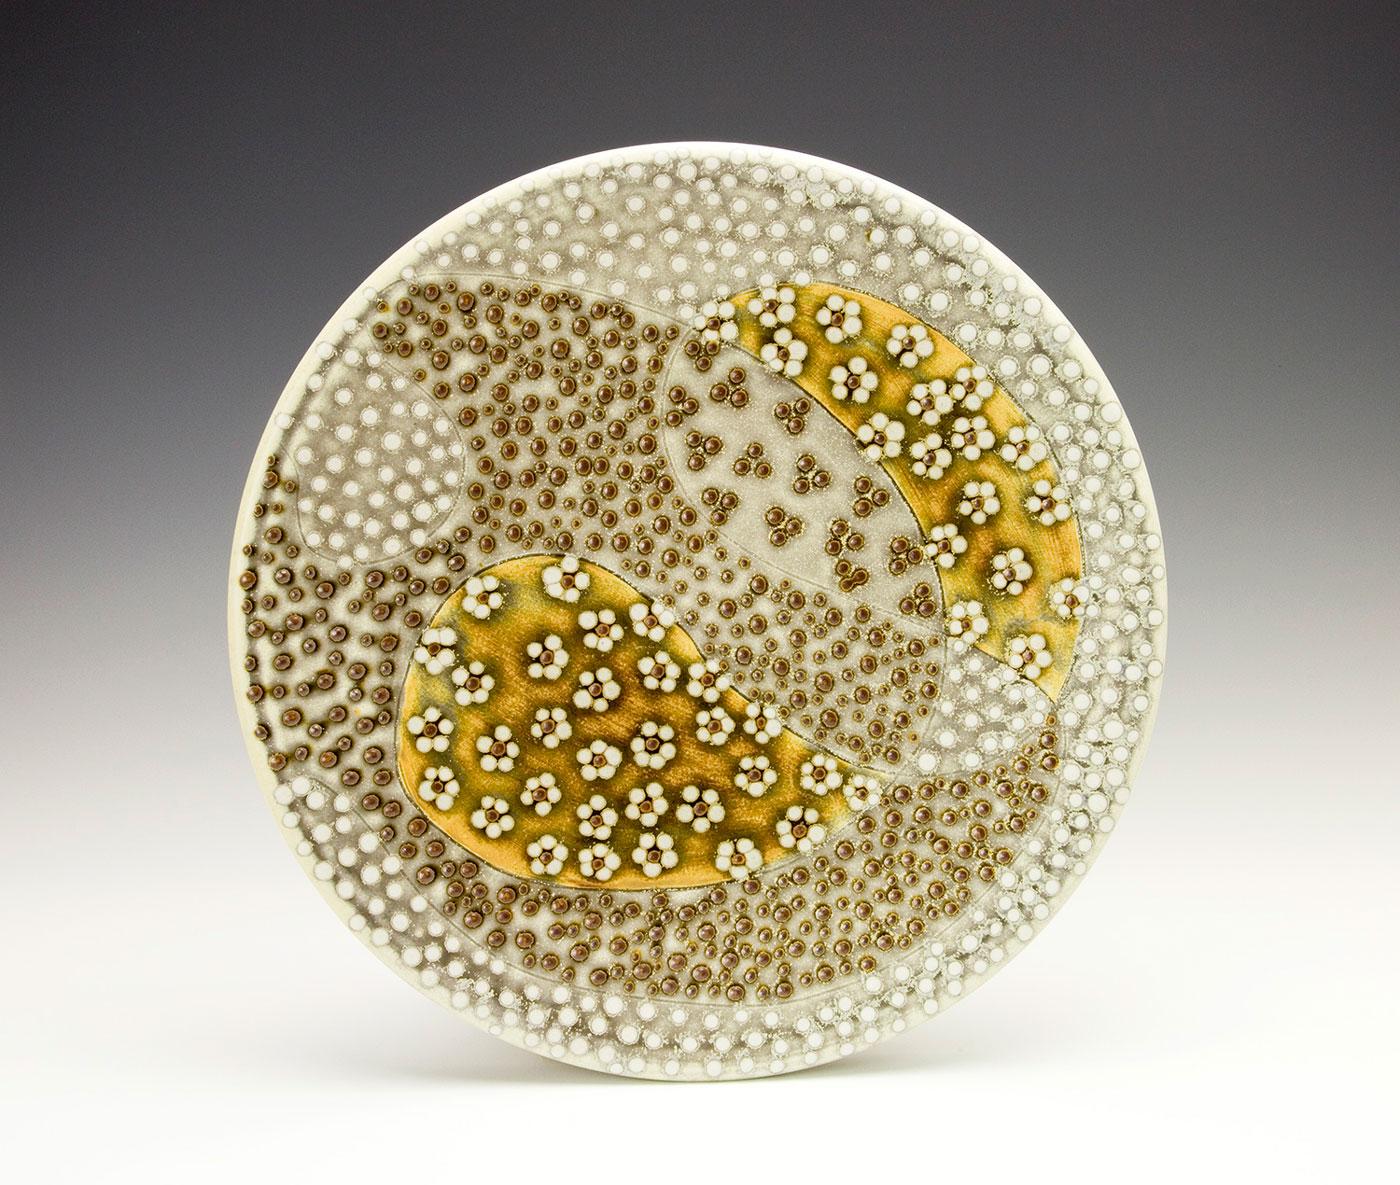 Pattern-Medley-studio-pottery-plate-Samantha-Henneke-Seagrove-North-Carolina.jpg